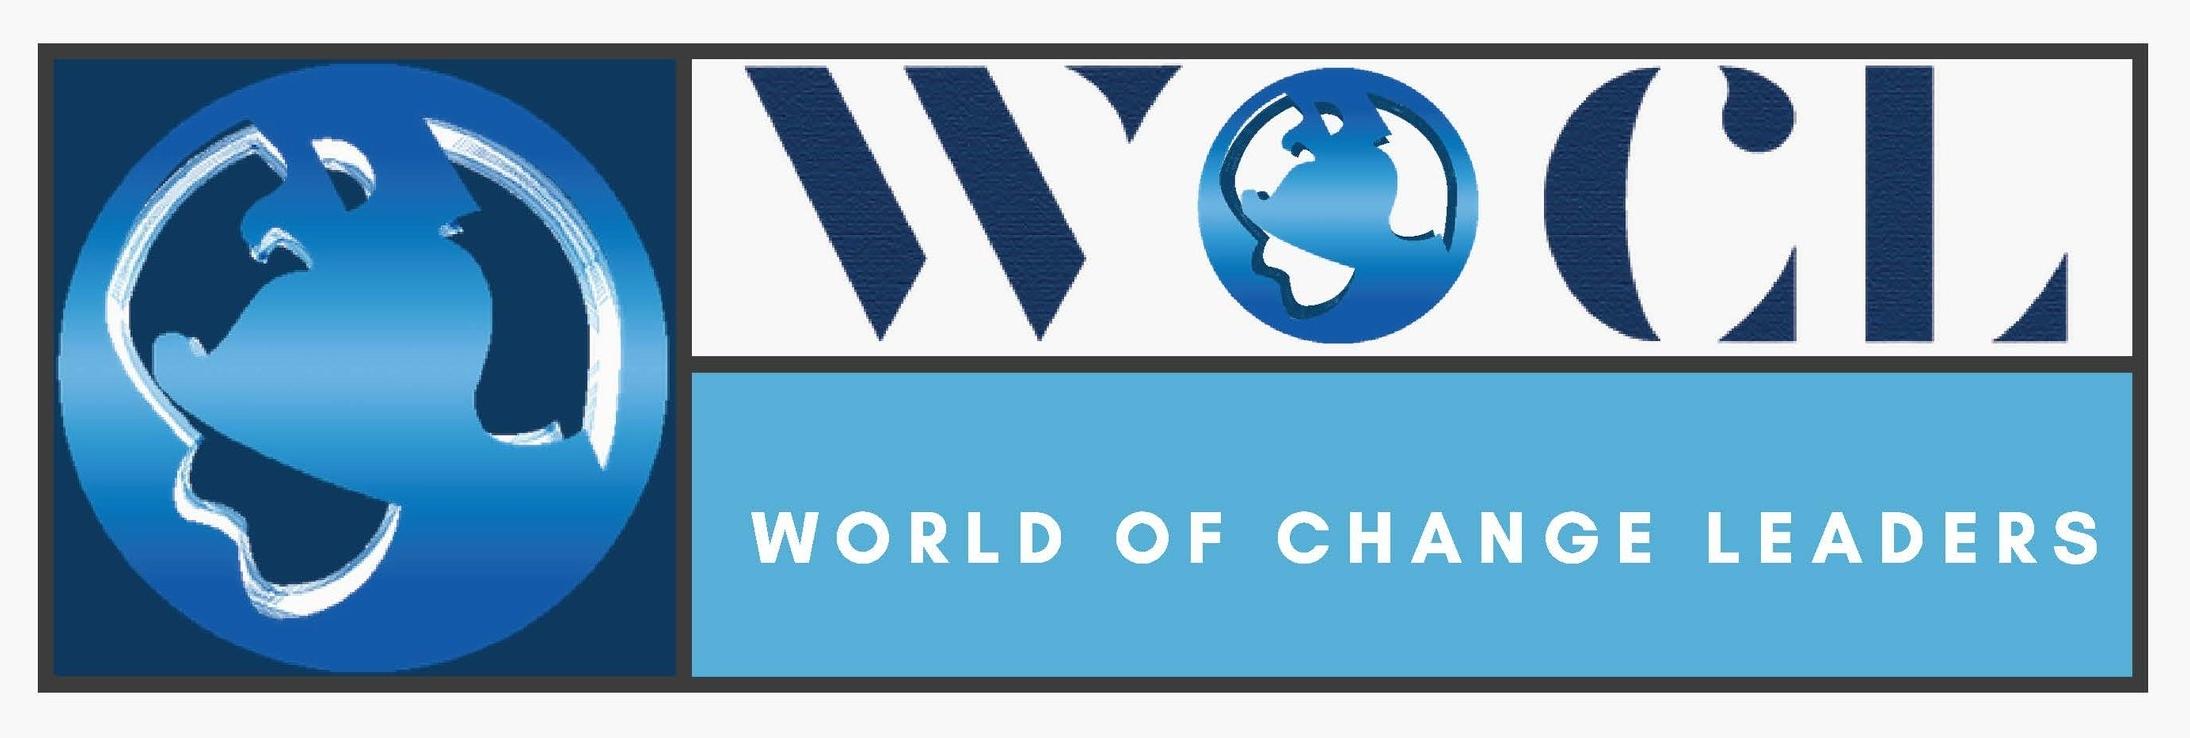 world of change leaders logo